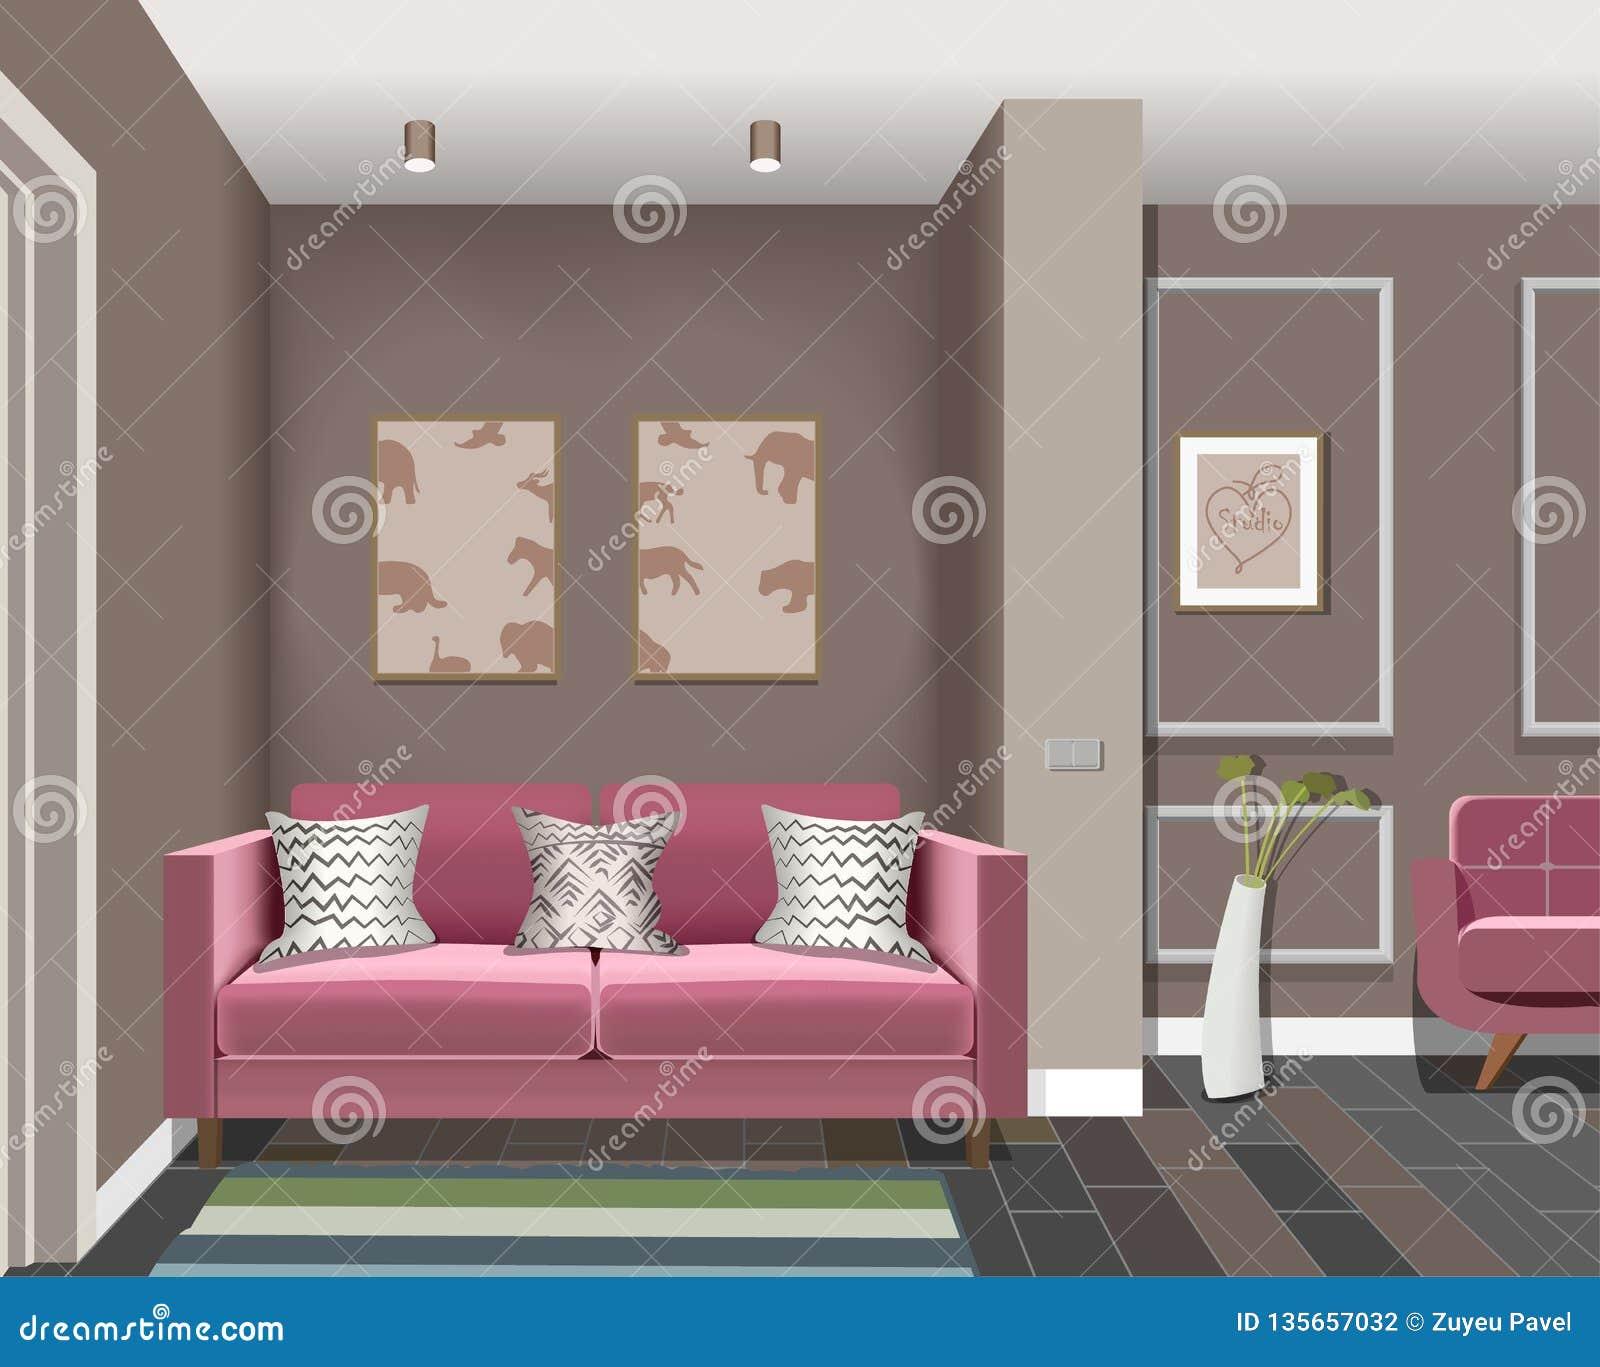 Иллюстрация комнаты с дверями, бургундского стула, бургундской софы, вазы, изображения Интерьер комнаты с мебелью